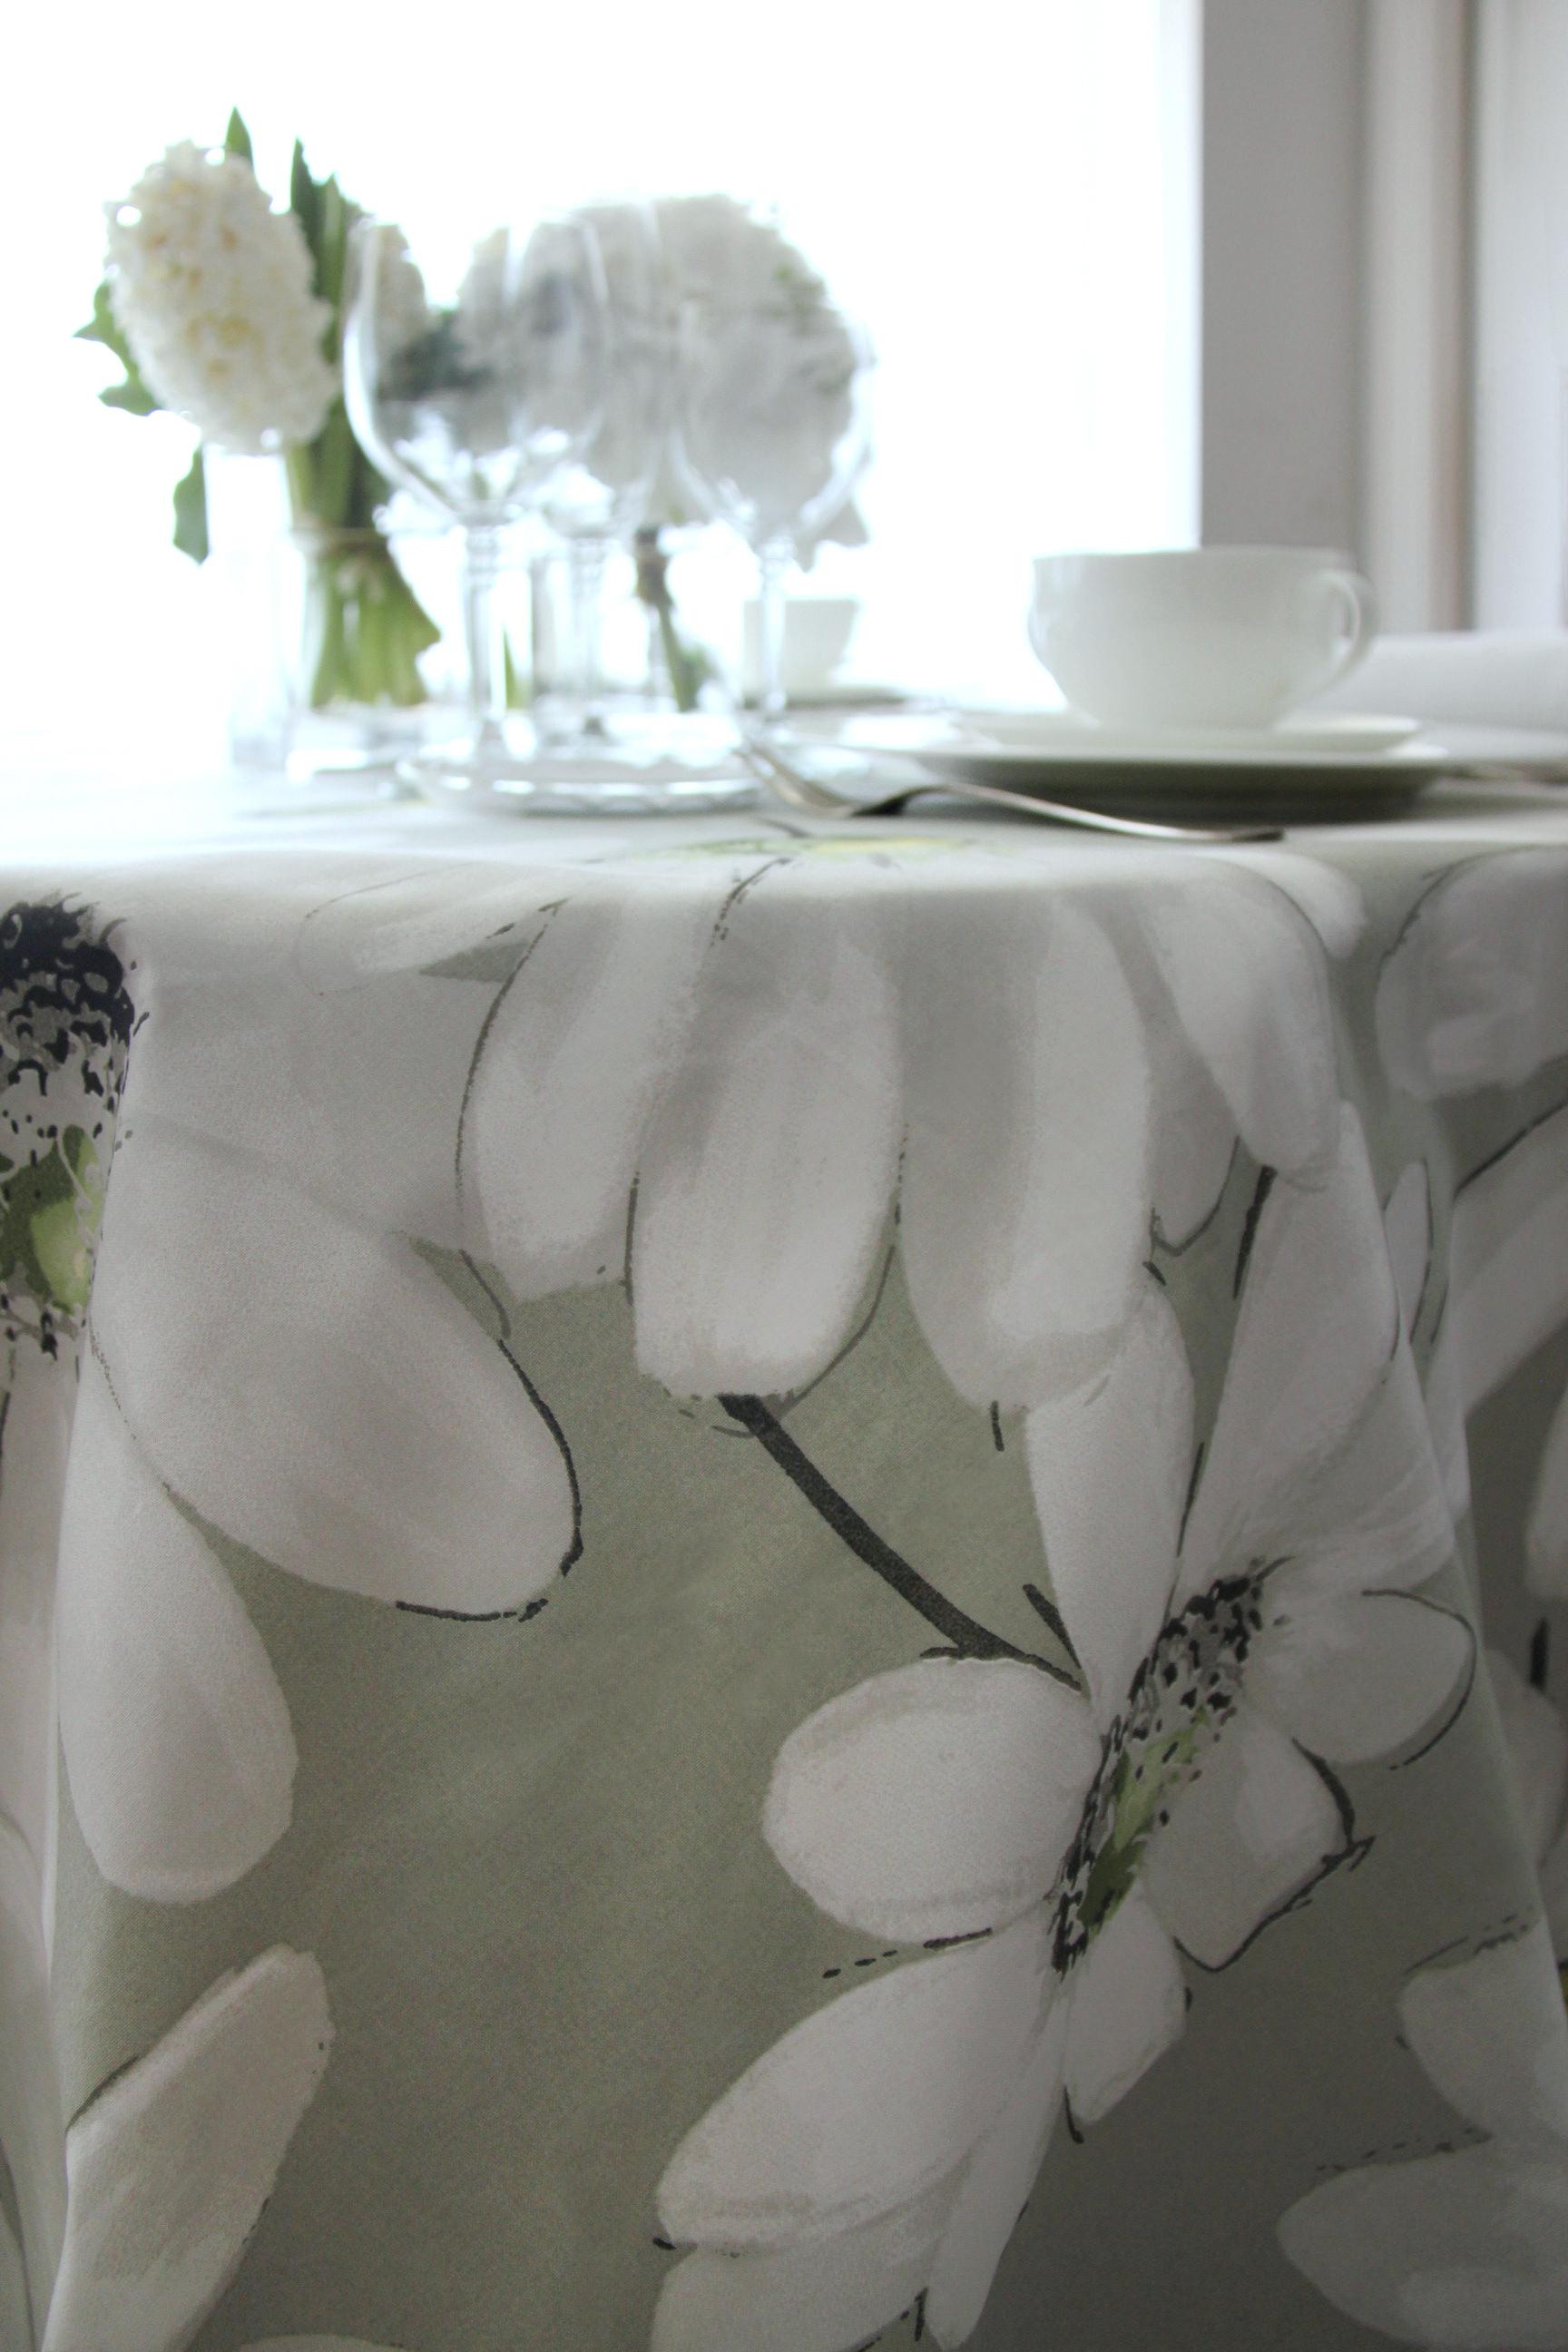 alquiler mantel Greta, para cualquier medida de mesa 350x350cm, para mesa redonda, para mesa rectangular, para mesa alargada, para mesa cuadrada, para mesa ovalada, para mesa alta